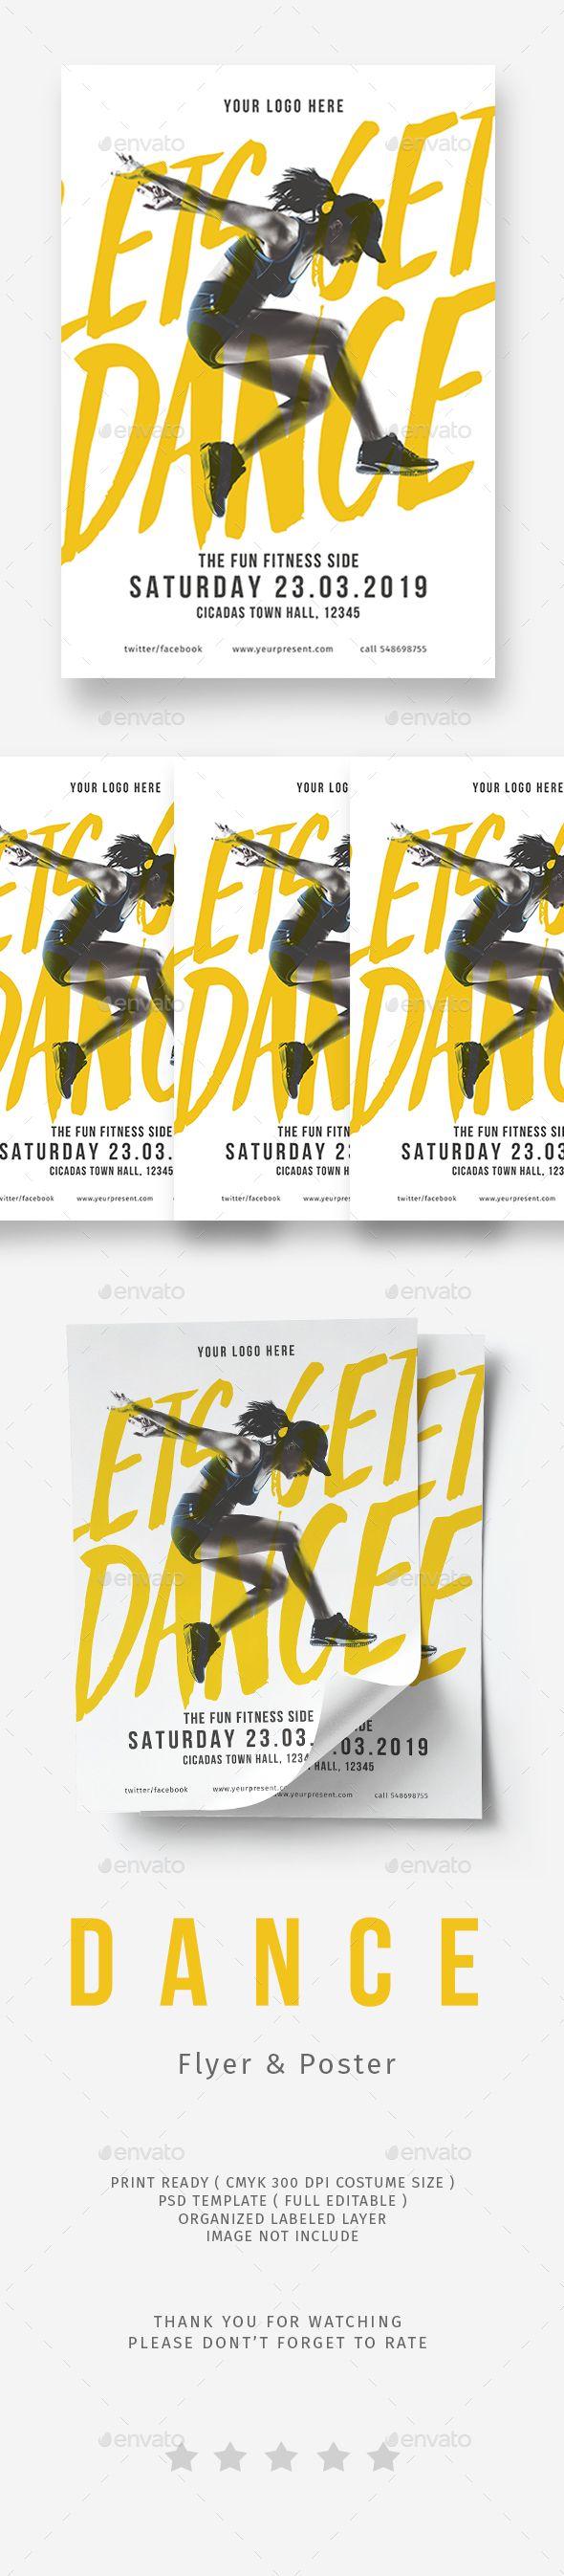 dance flyer pinterest flyer template dancing and template